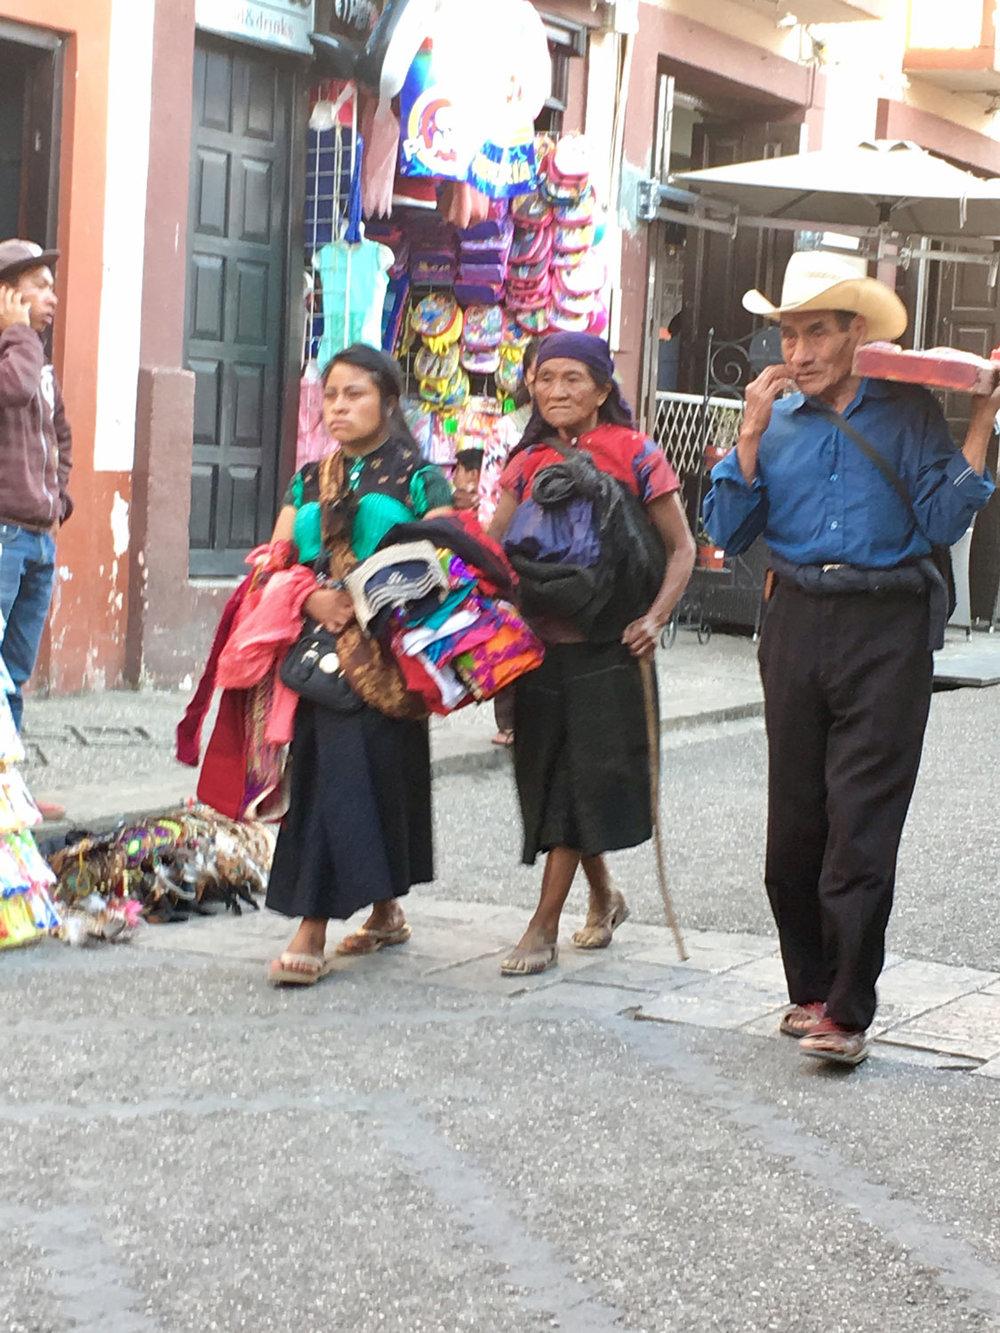 Hammocks_and_Ruins_Town_Villages_Chiapas_San_Cristobal_de_las_Casas_34.jpg